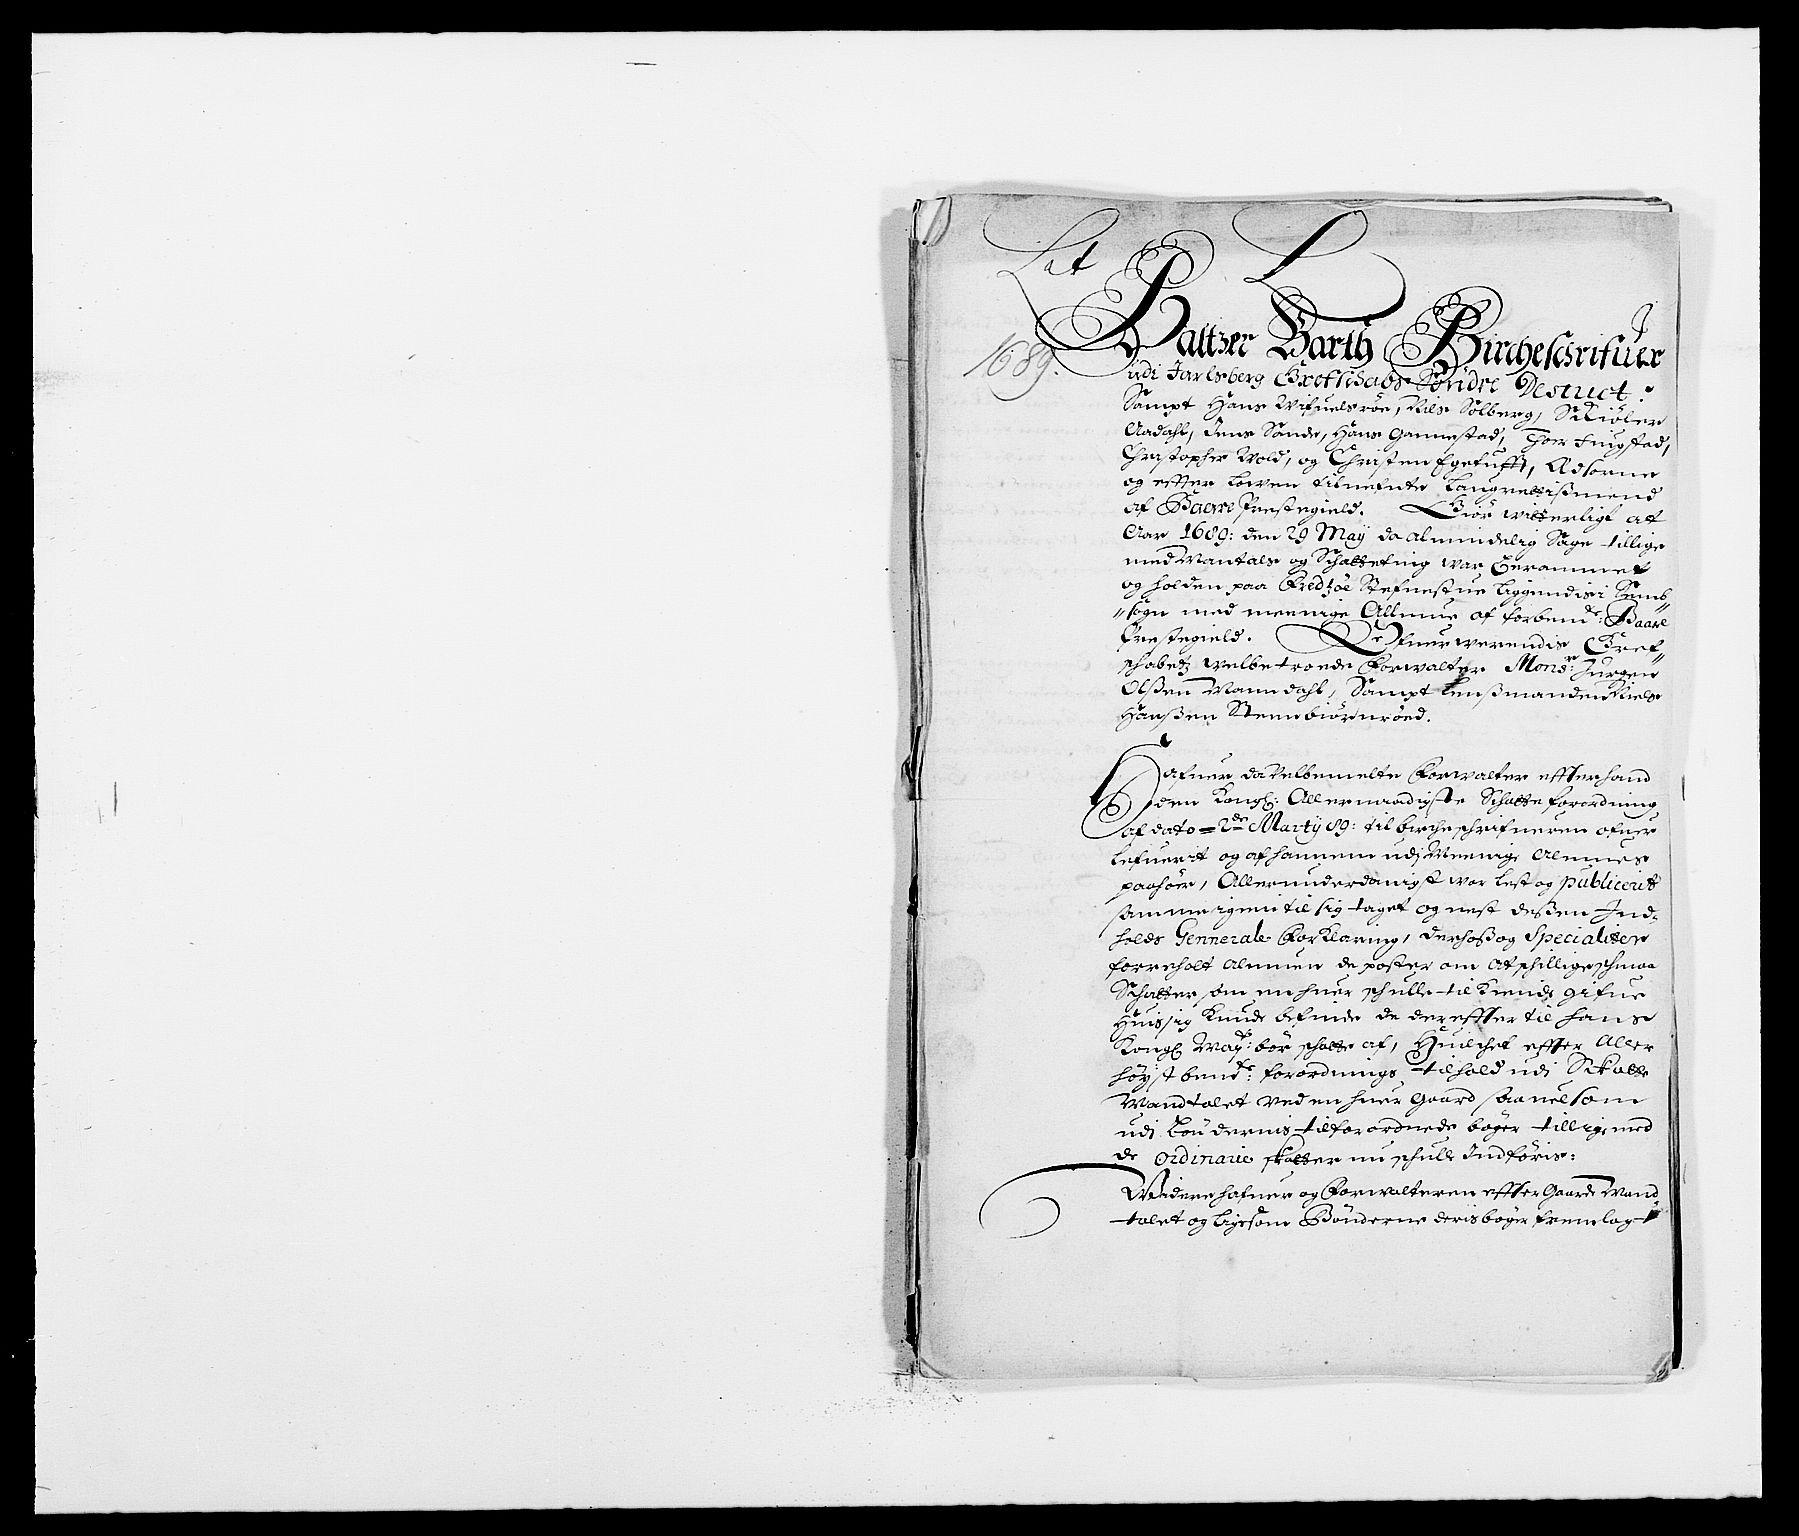 RA, Rentekammeret inntil 1814, Reviderte regnskaper, Fogderegnskap, R32/L1860: Fogderegnskap Jarlsberg grevskap, 1686-1690, s. 468